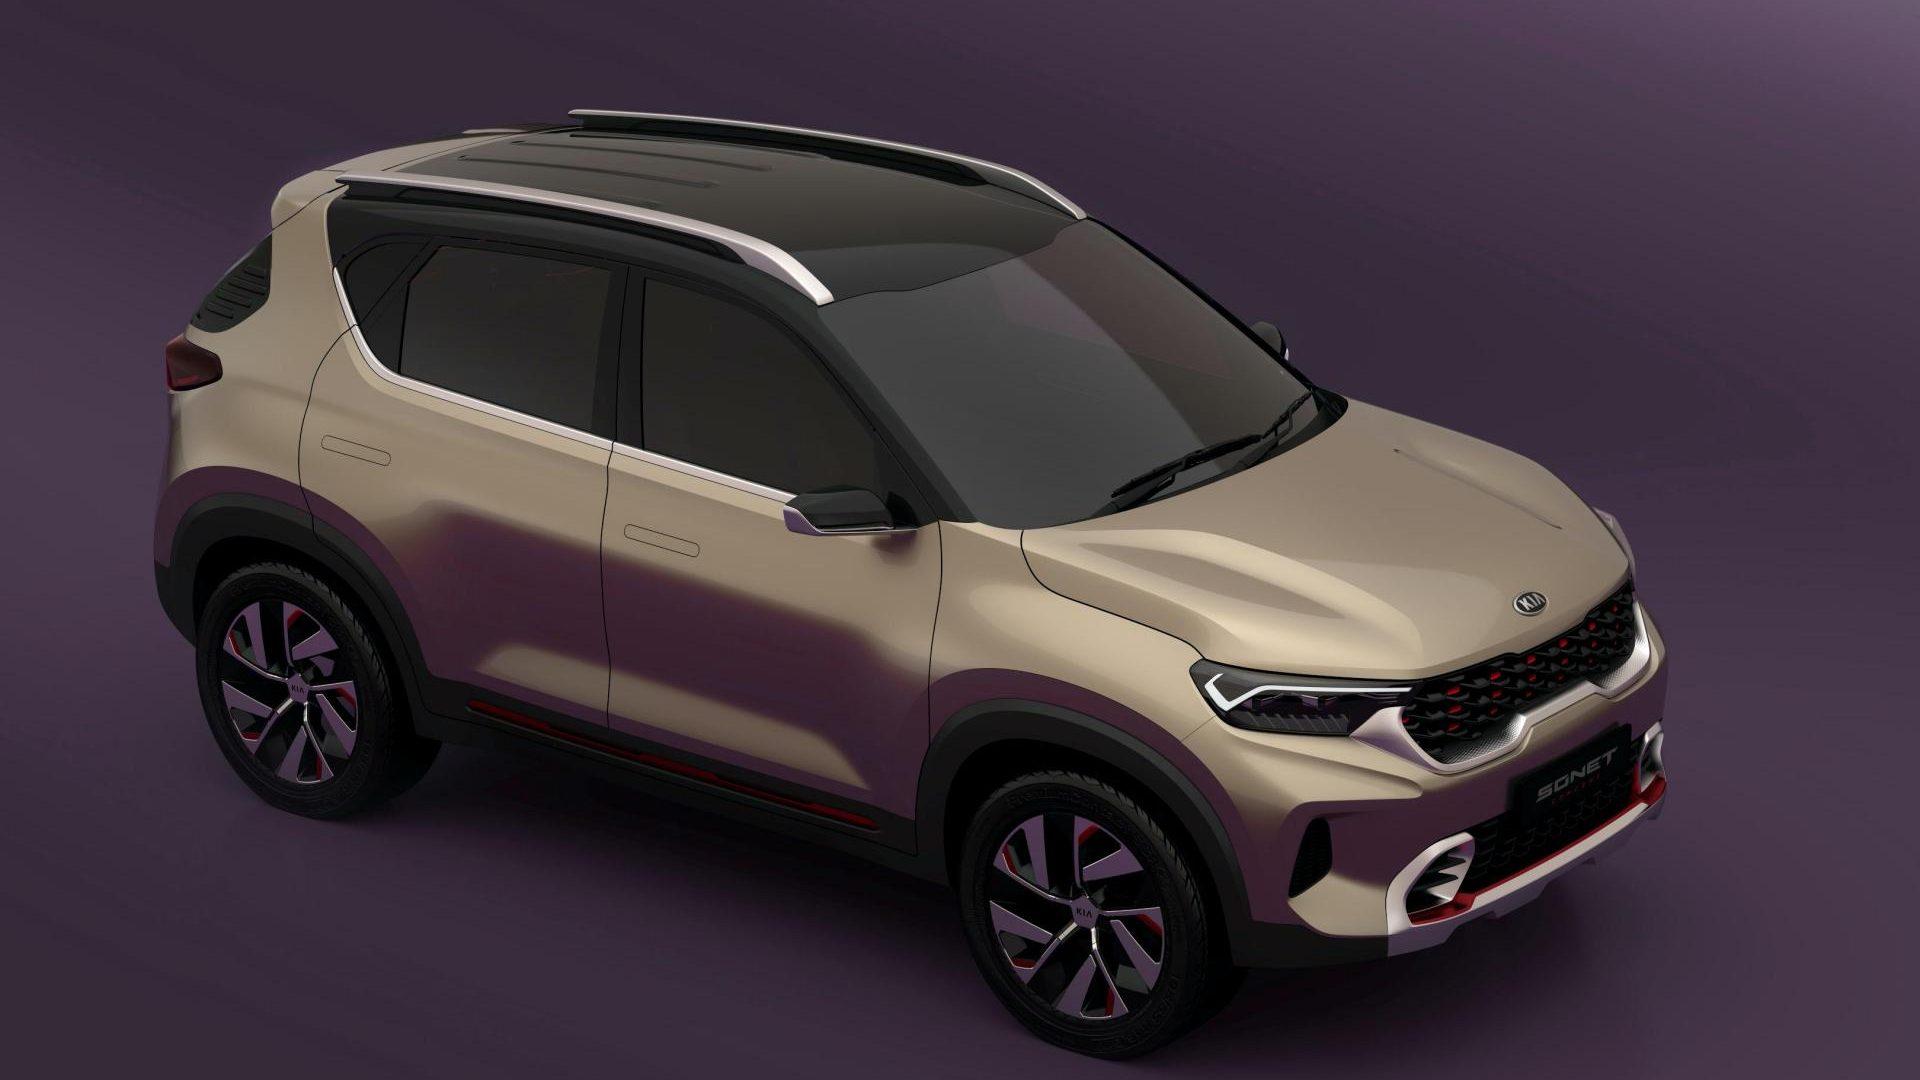 2020-Kia-Sonet-Concept-02